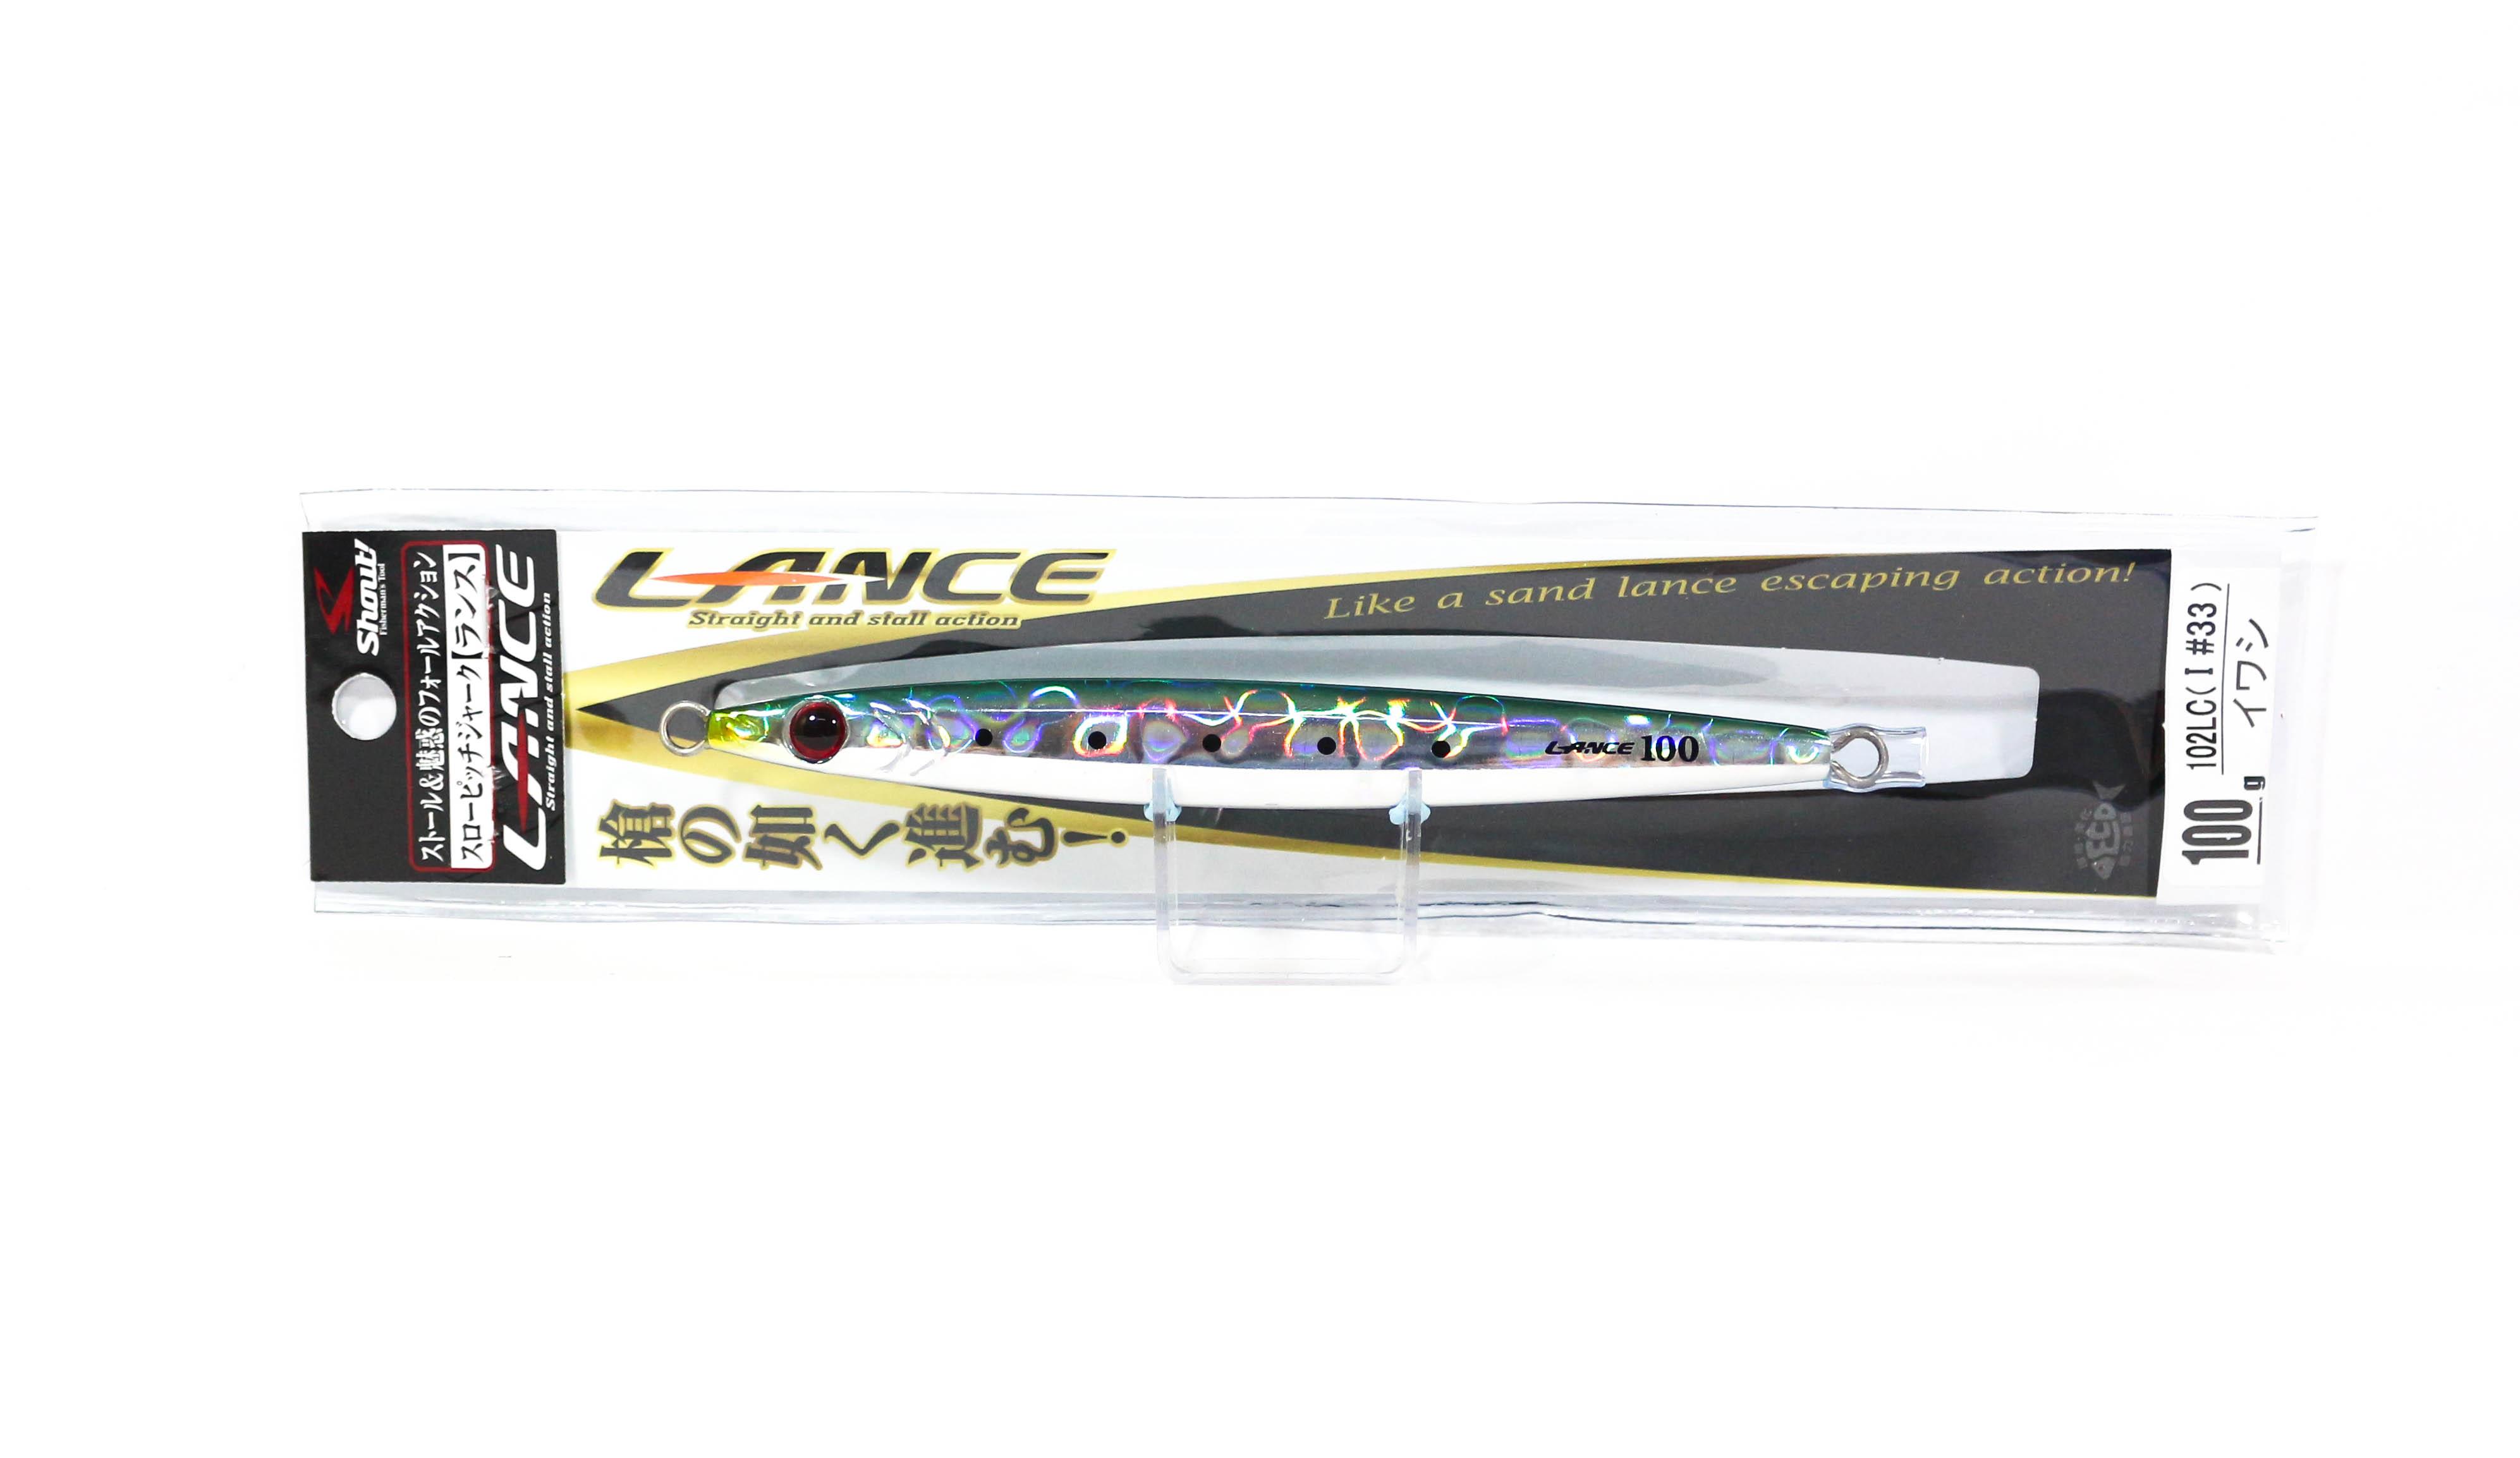 Shout 102-LC Metal Jig Lance Slow Fall Long 100 grams I (7857)